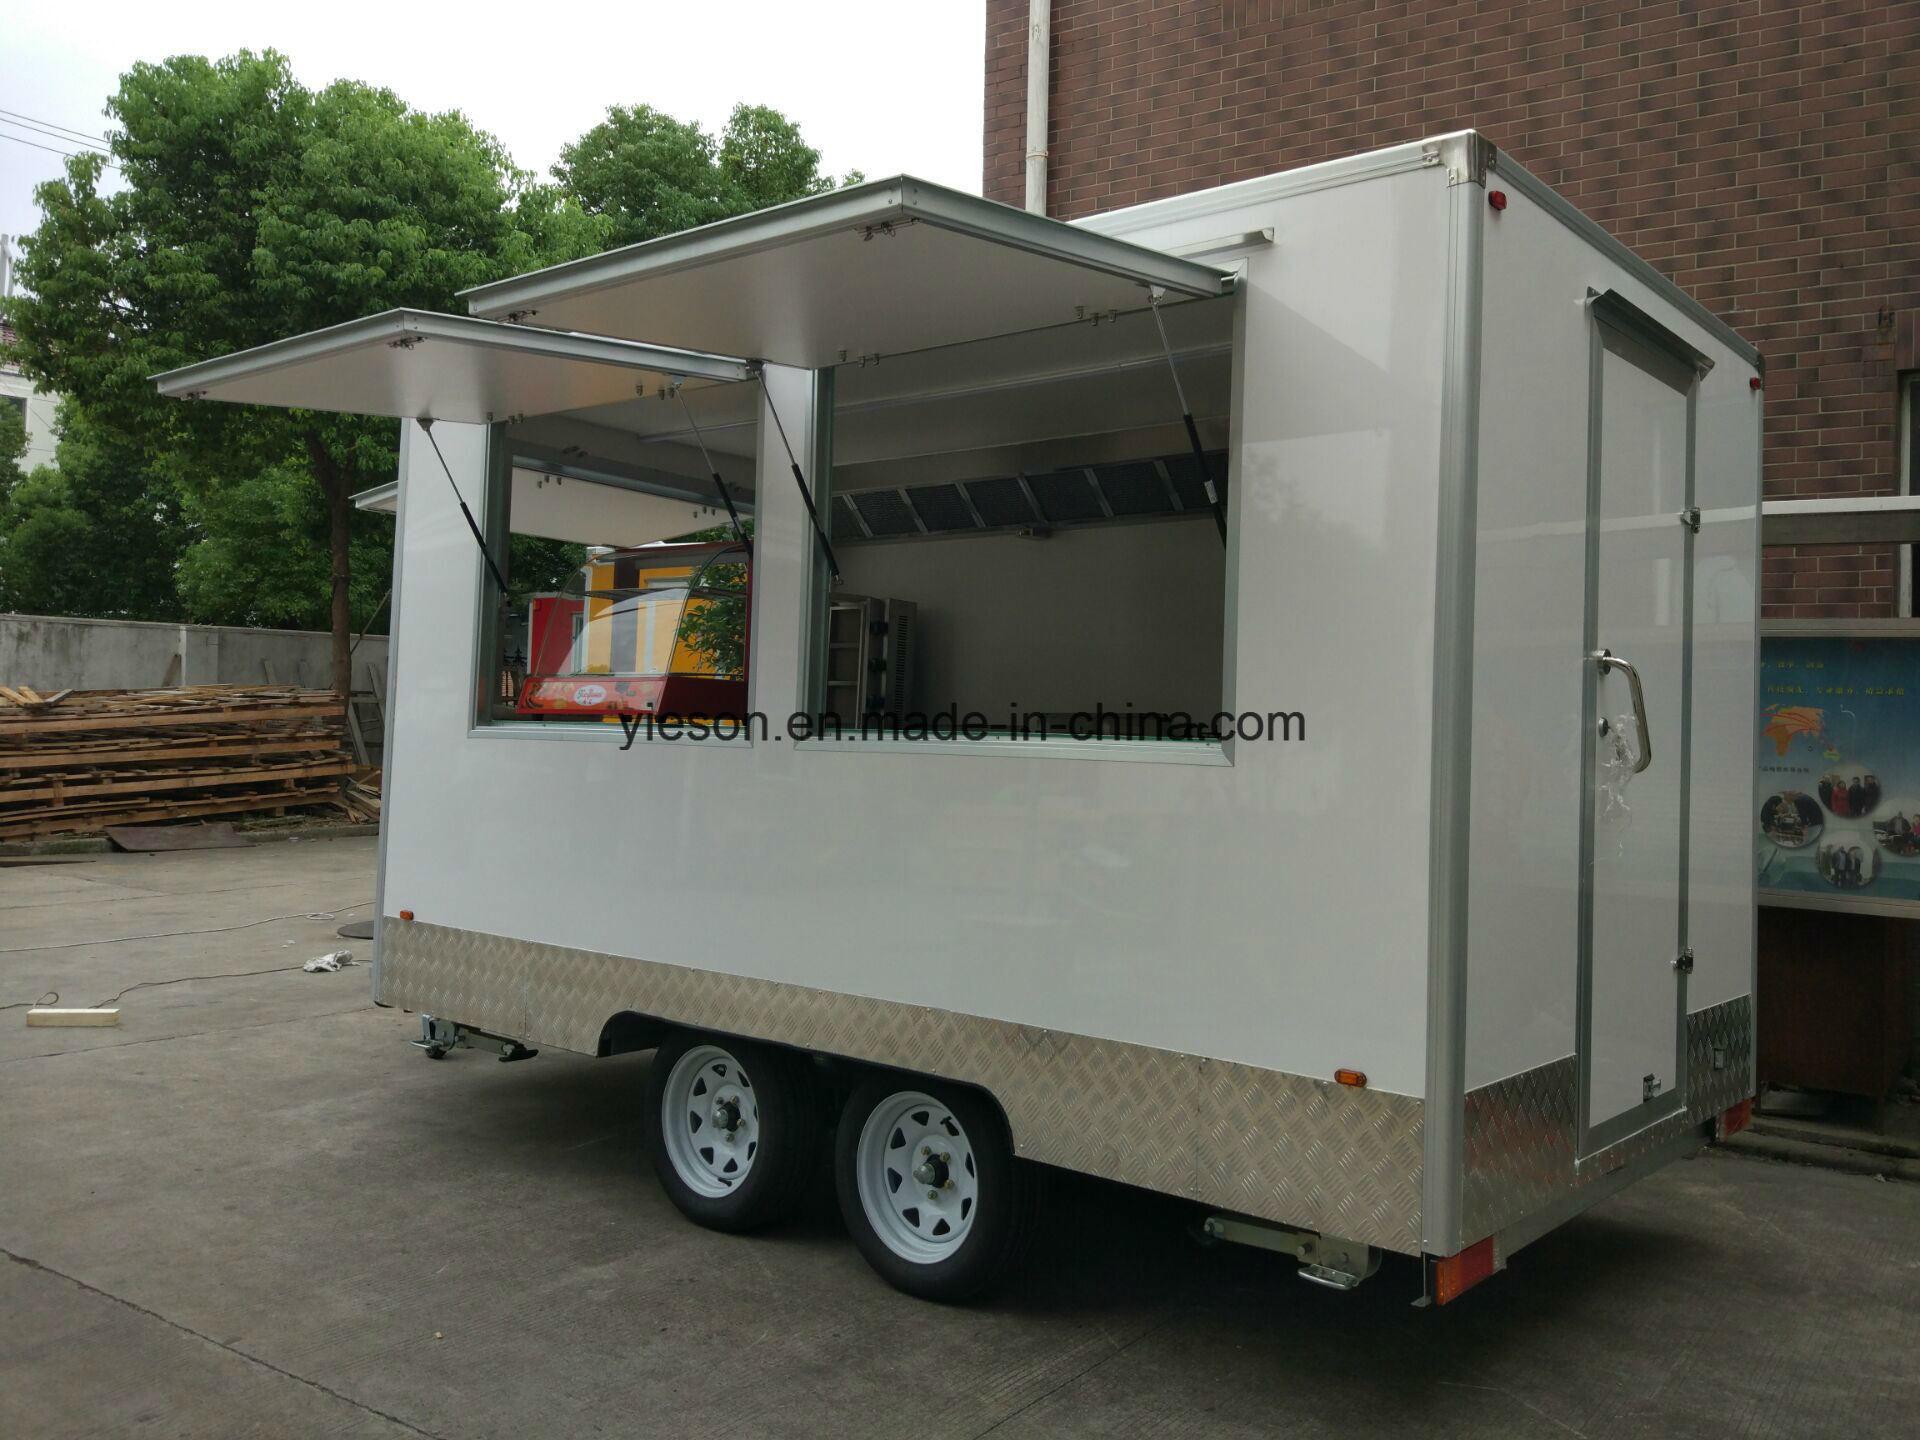 Commercial Food Cart Mobile Food Cart Trailer Food Trucks Ys-Fb390c